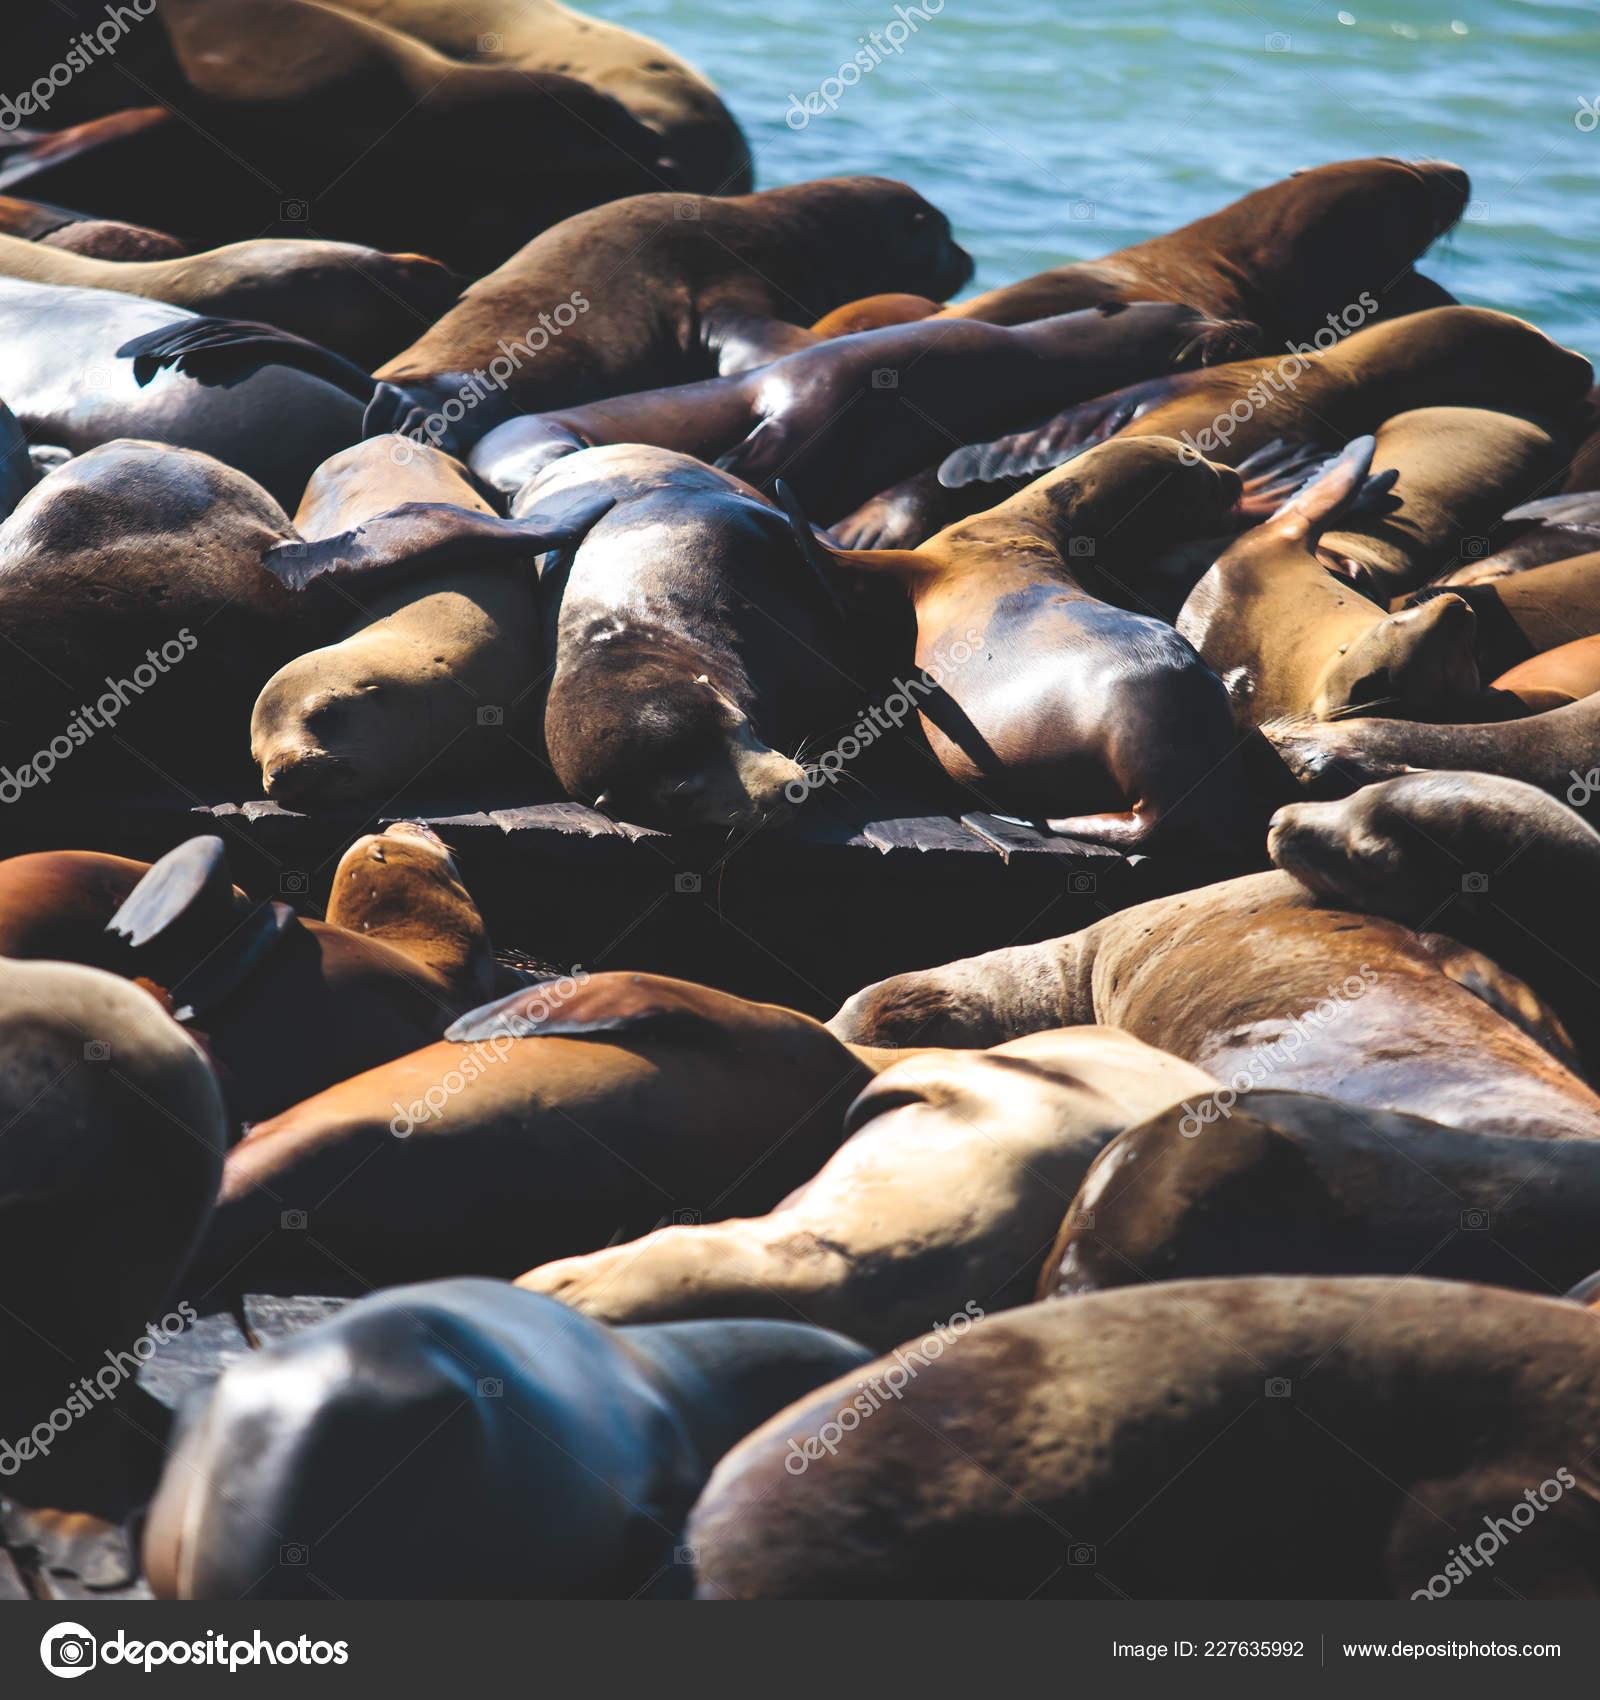 View Pier Seals Sea Lions Wooden Platforms Fisherman Wharf San Stock Photo C Tsuguliev 227635992